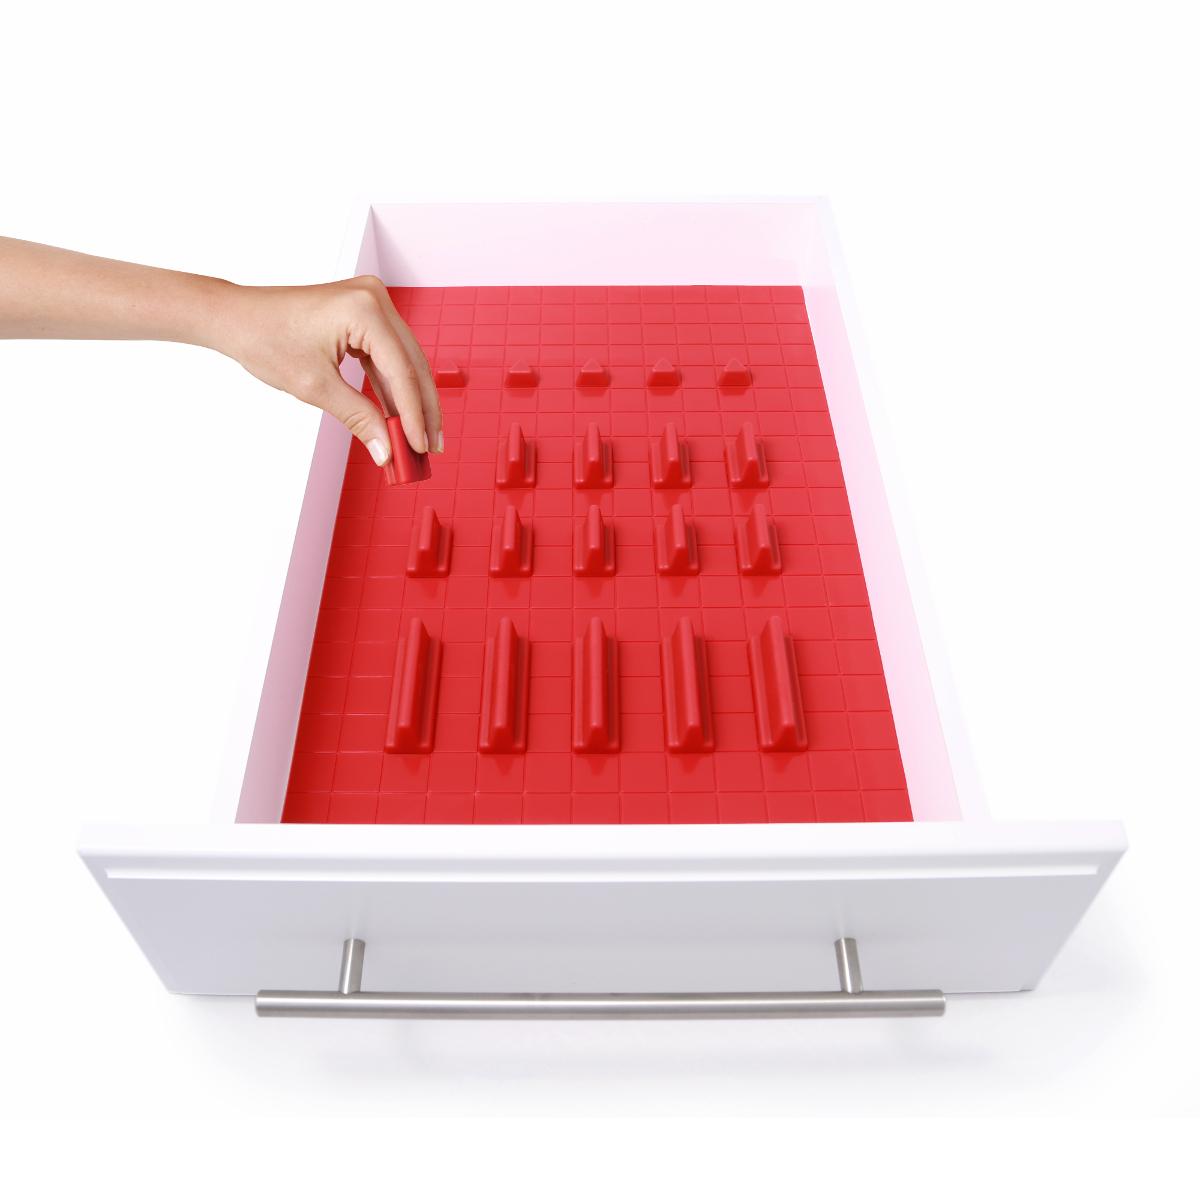 KMN Home DrawerDecor Red Silicone 21 Piece Customizable Drawer Organizer Deluxe Starter Kit